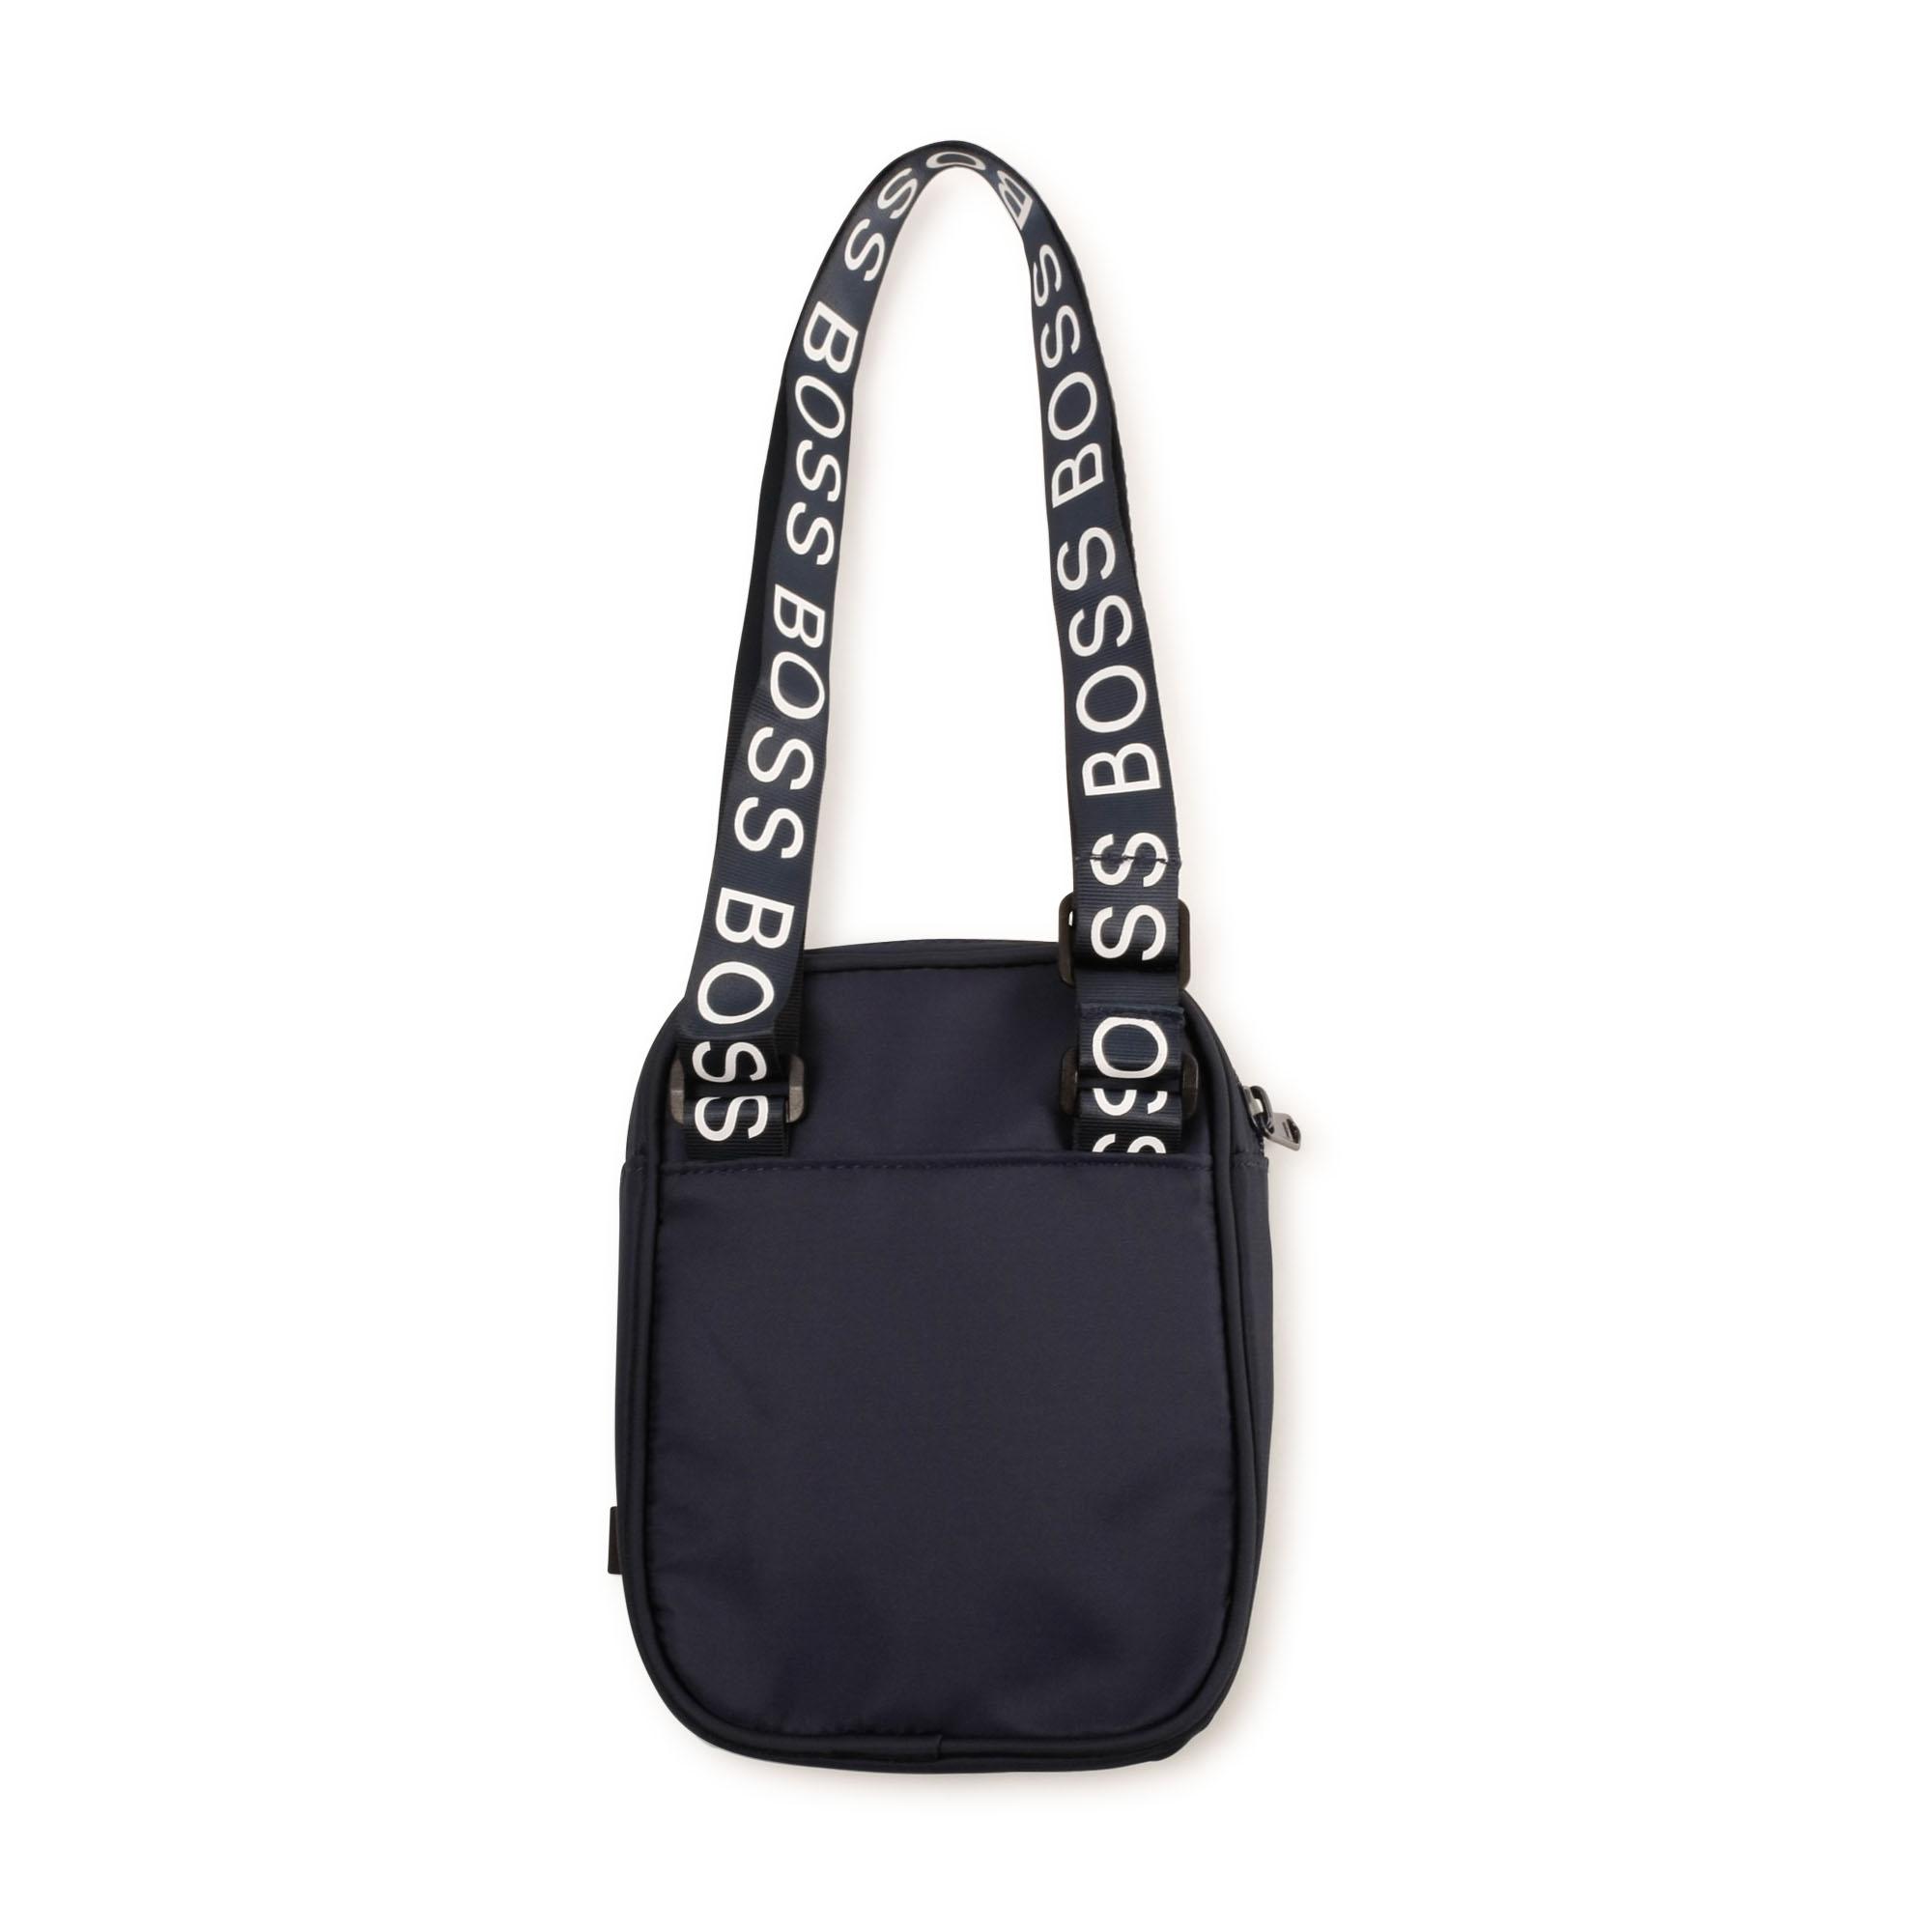 Adjustable crossbody bag BOSS for BOY